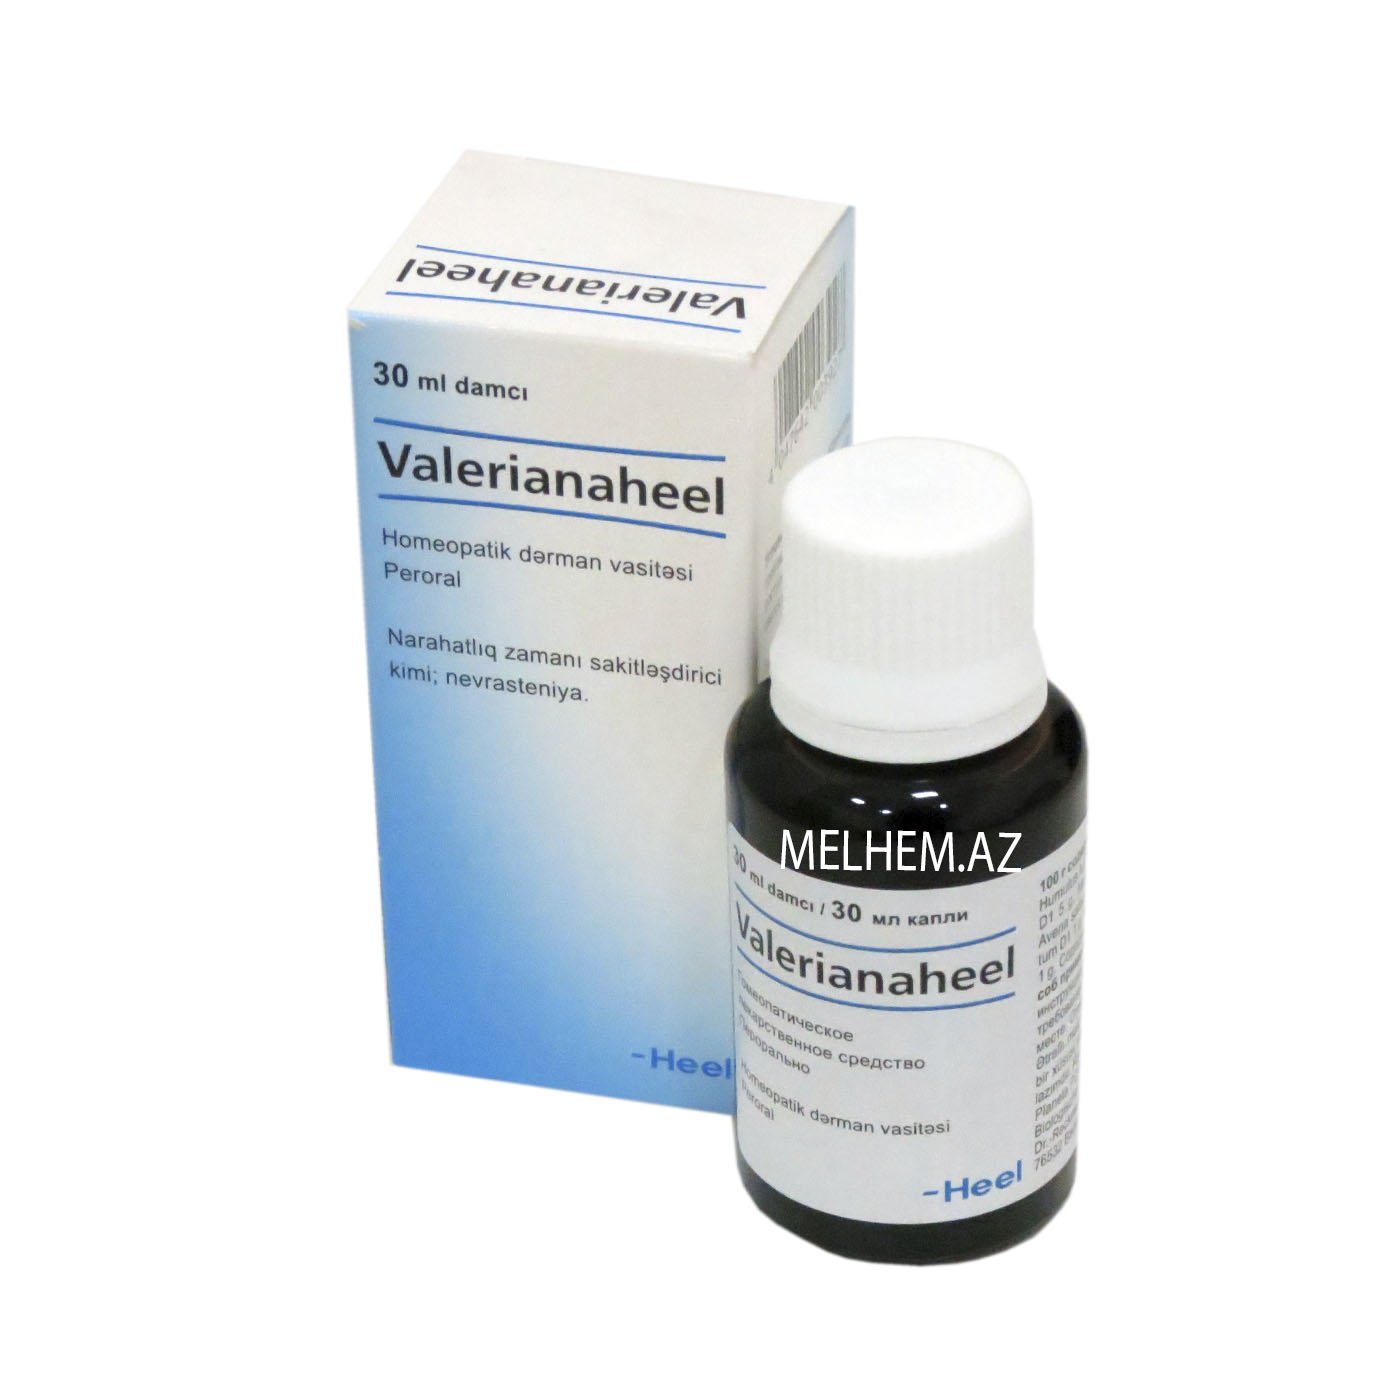 VALERİANAHEEL 30 ML DAMCI